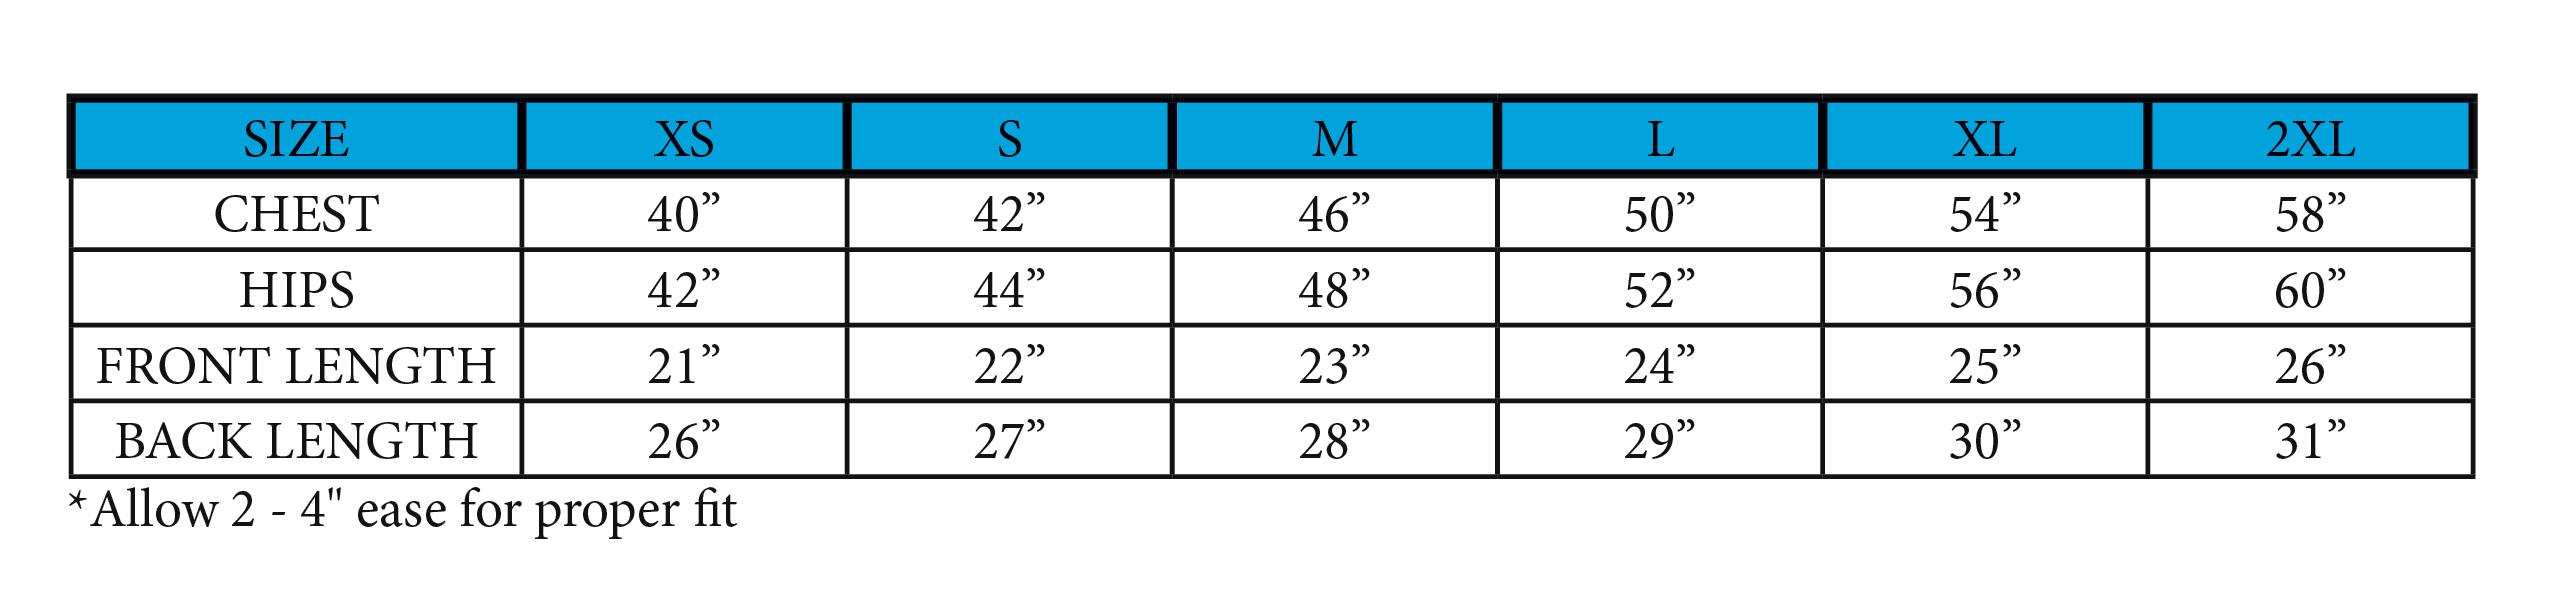 vest-size-chart.jpg